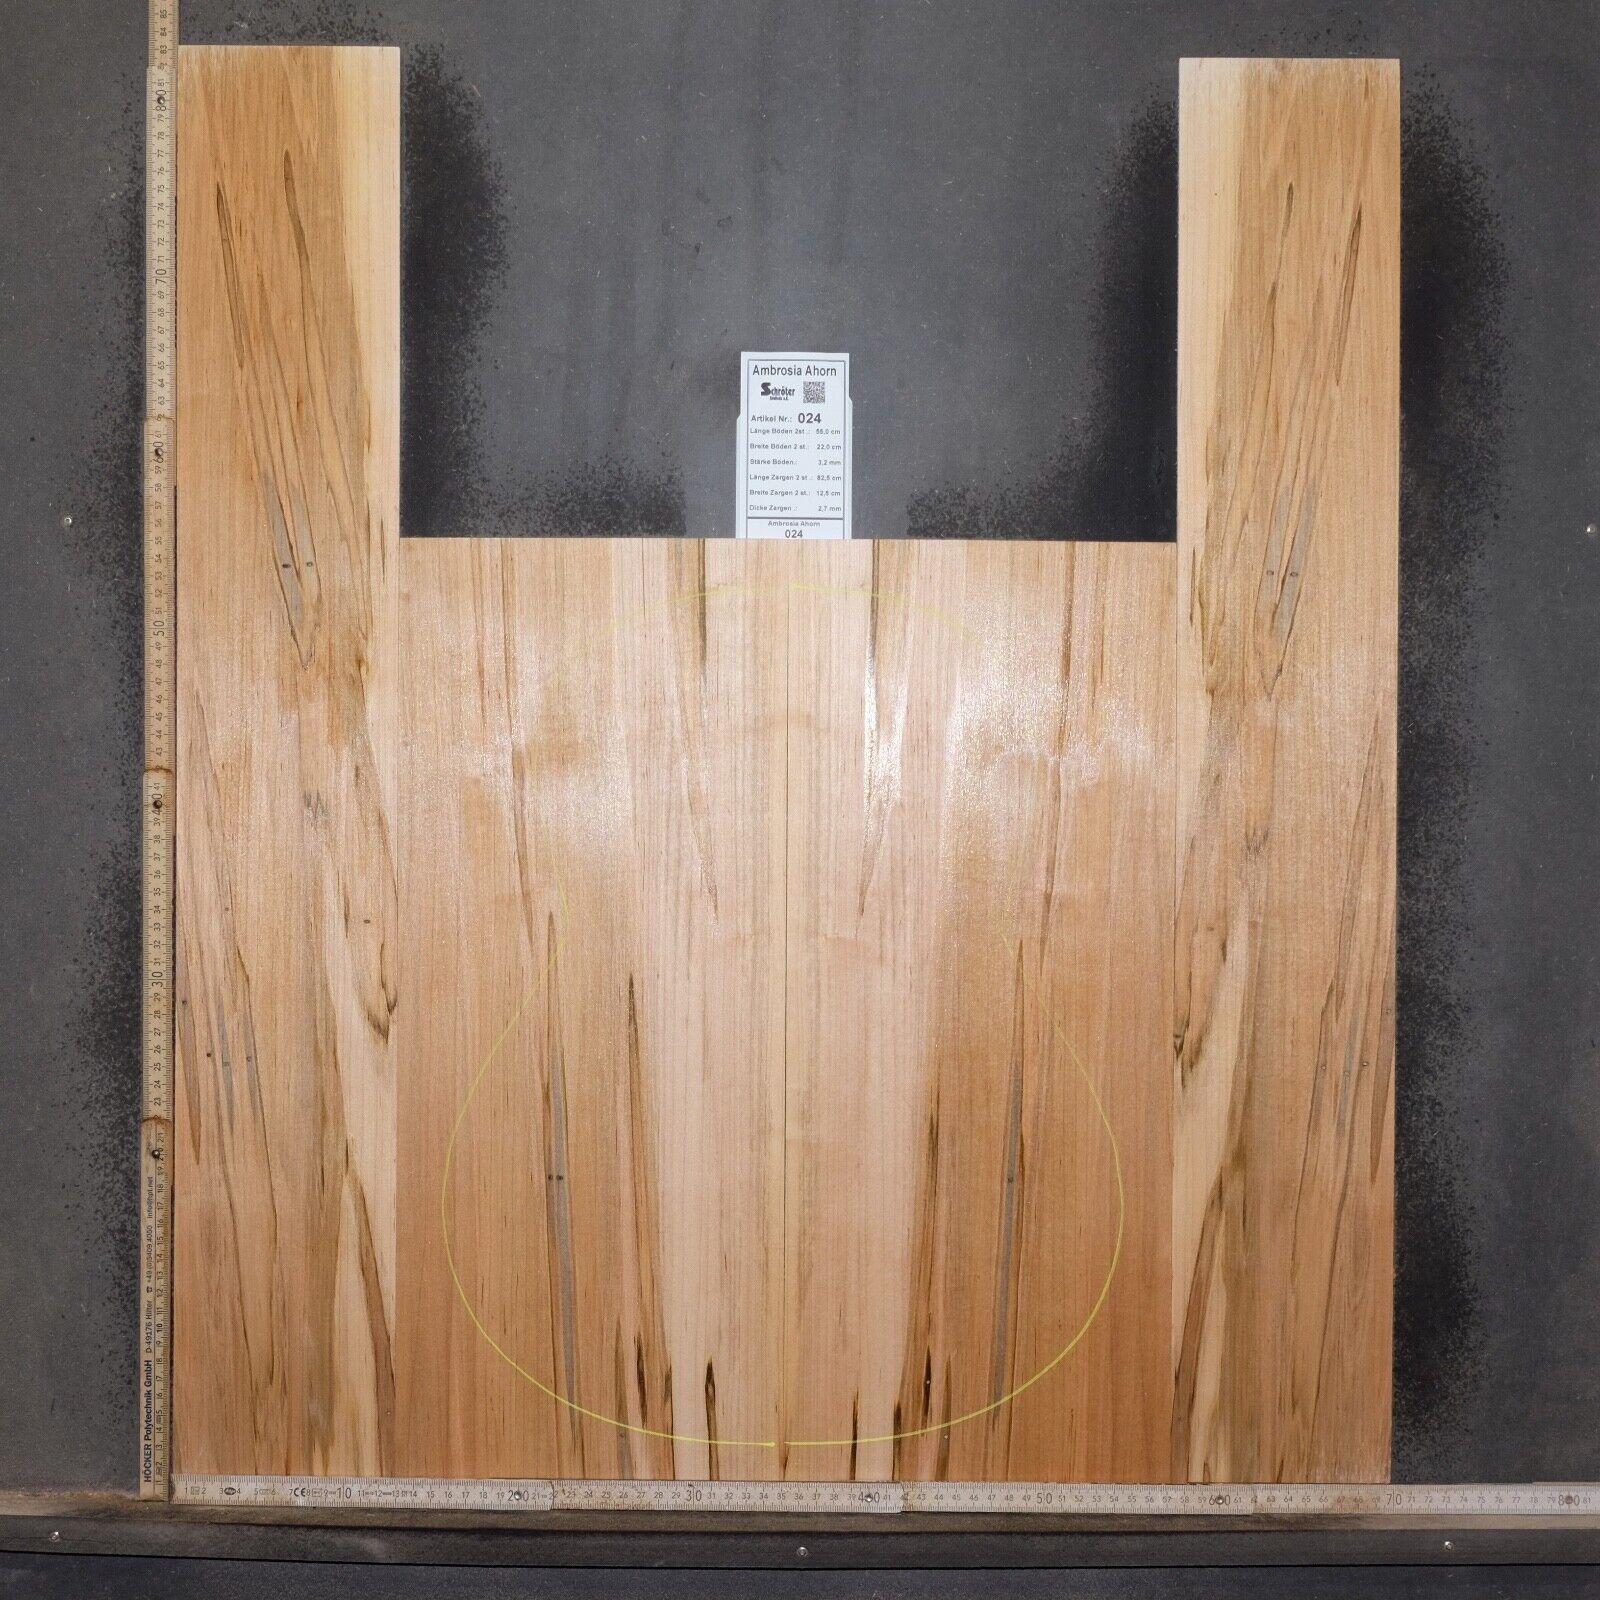 nelle promozioni dello stadio Tonewood Ambrosia Acero Acero Acero Maple figured Tonholz Guitar Acoustic backs & sides 024  profitto zero